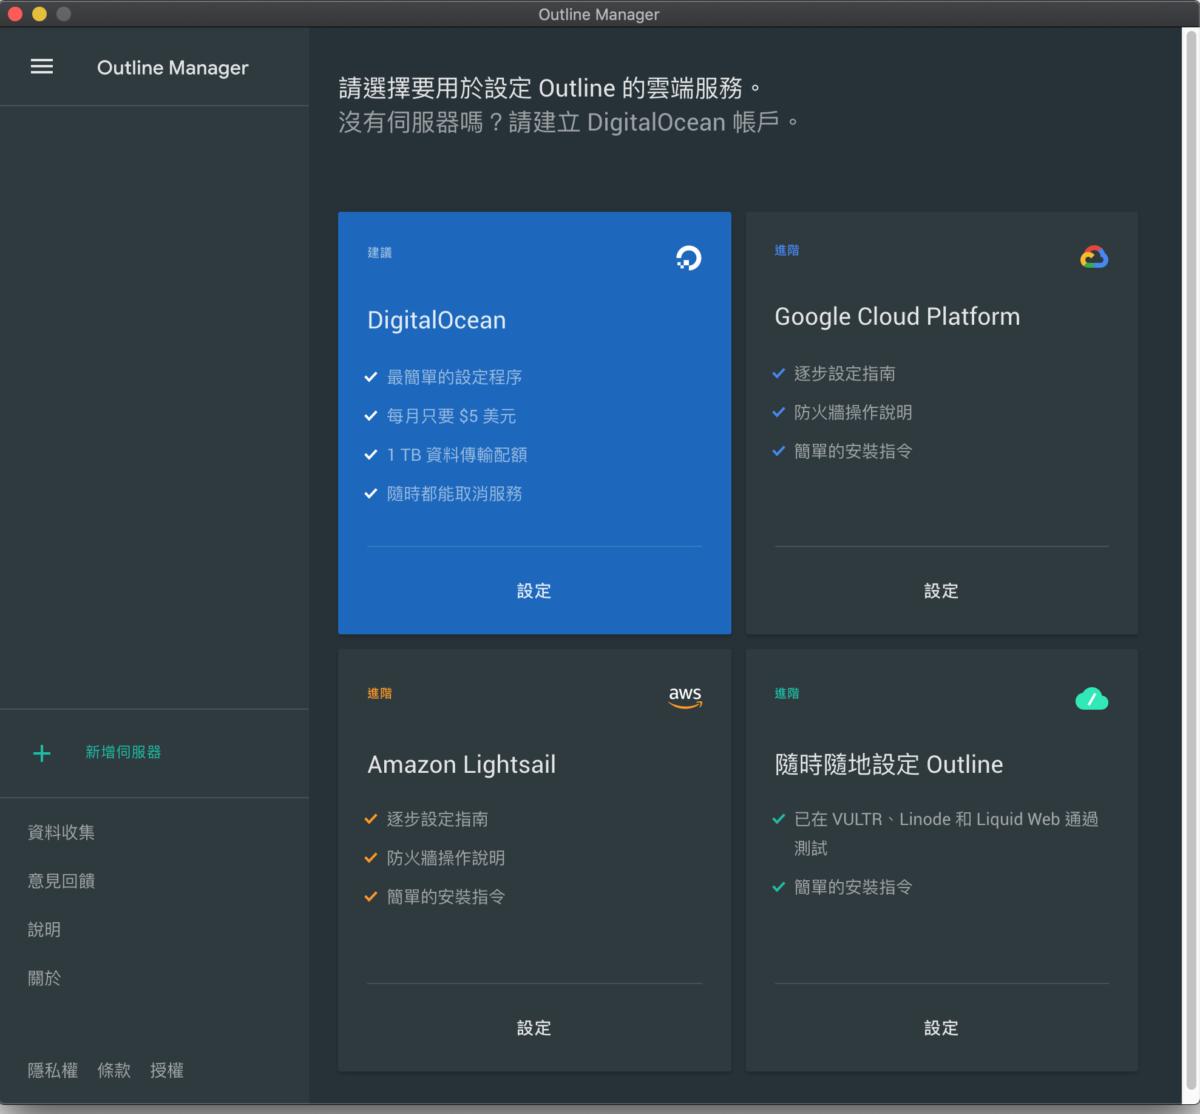 Step 2 安裝後隨即轉到主介面,已可見到 Digital Ocean、GCP、AWS及其他選項。由於在 Digital Ocean 的伺服器建立 Outline VPN 會是最簡單方便的方案,當然是首選。